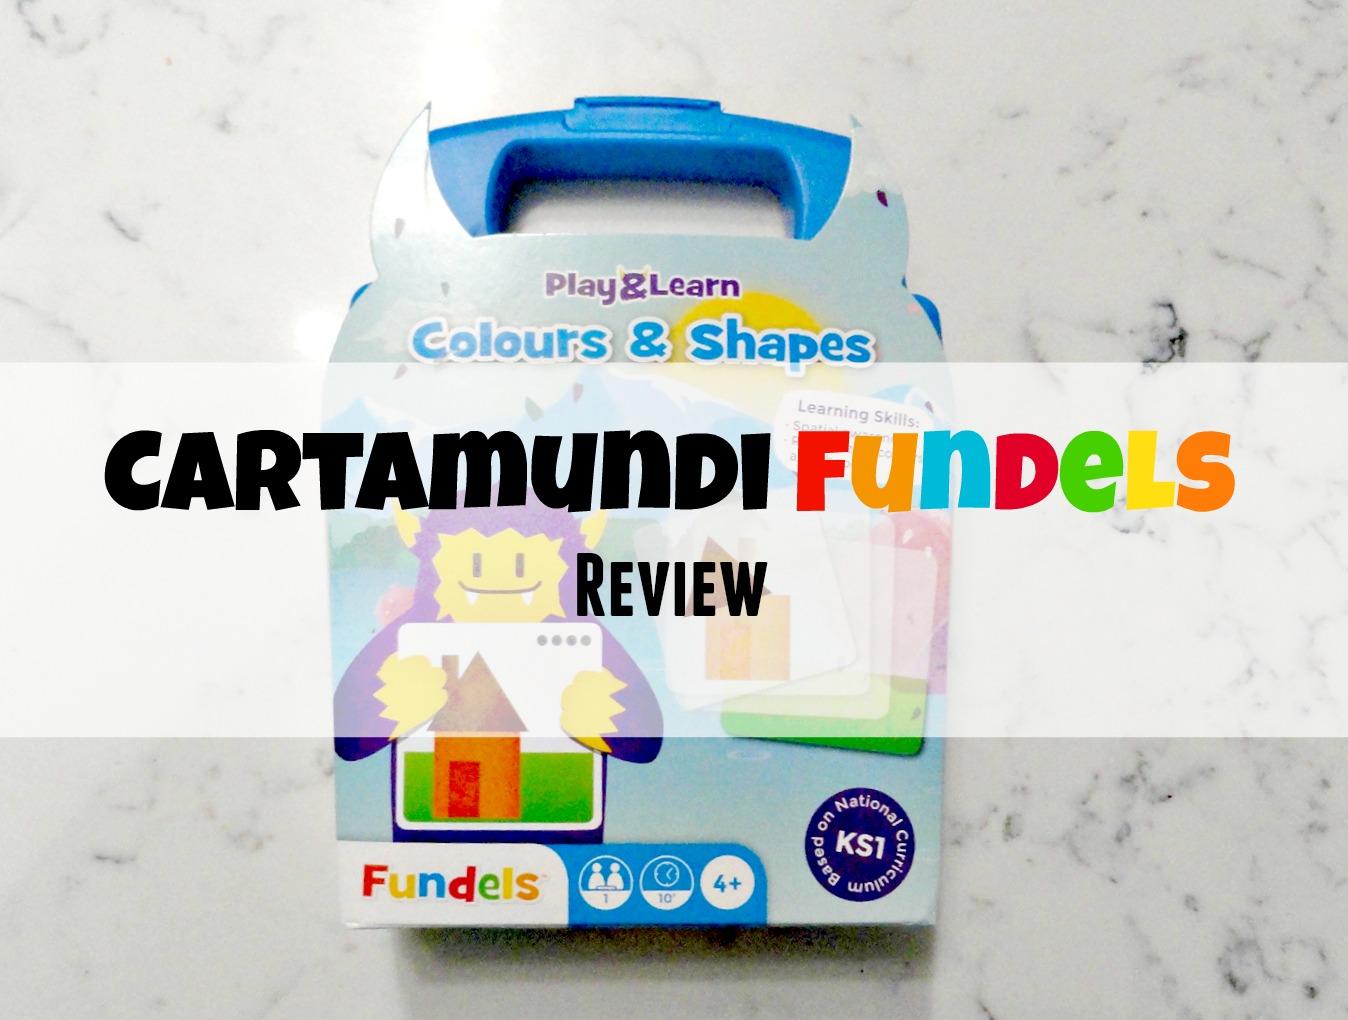 Cartamundi Fundels Play & Learn Colours Game + Giveaway | Janine\'s ...